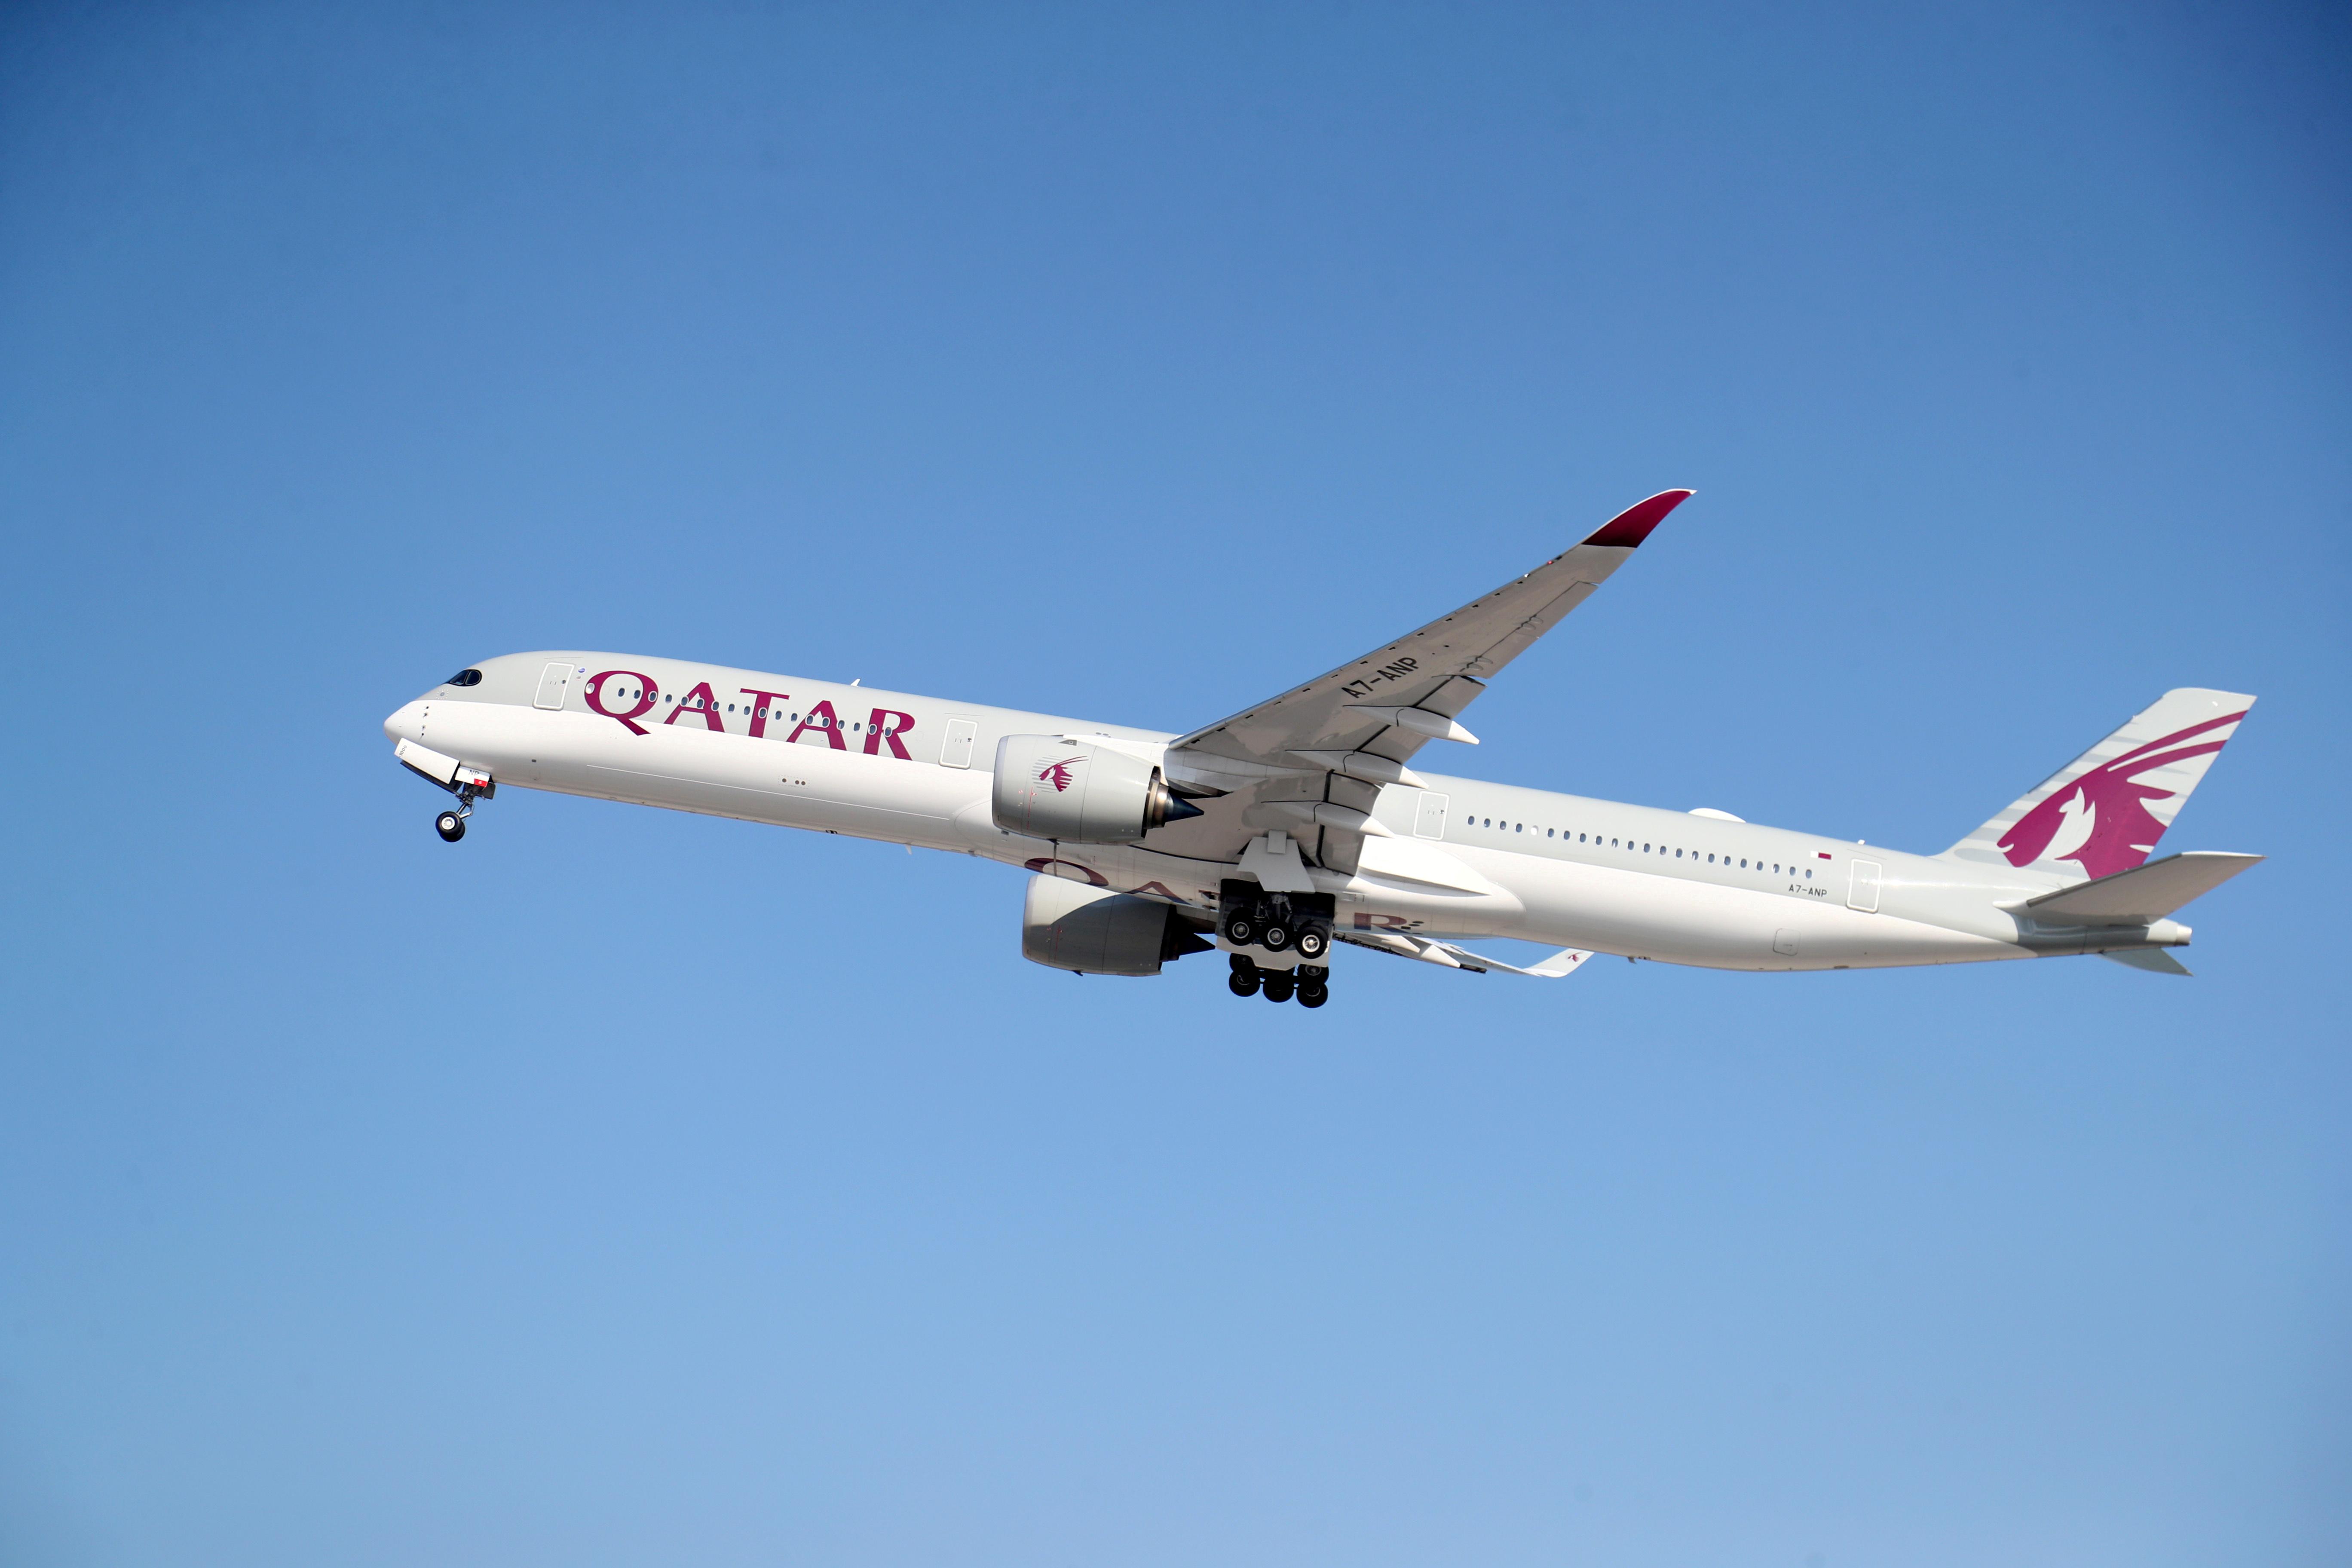 A Qatar Airways plane takes off at Hamad International Airport, as the country resumes international flights to Saudi Arabia, in Doha, Qatar January 11, 2021. REUTERS/Ibraheem Al Omari